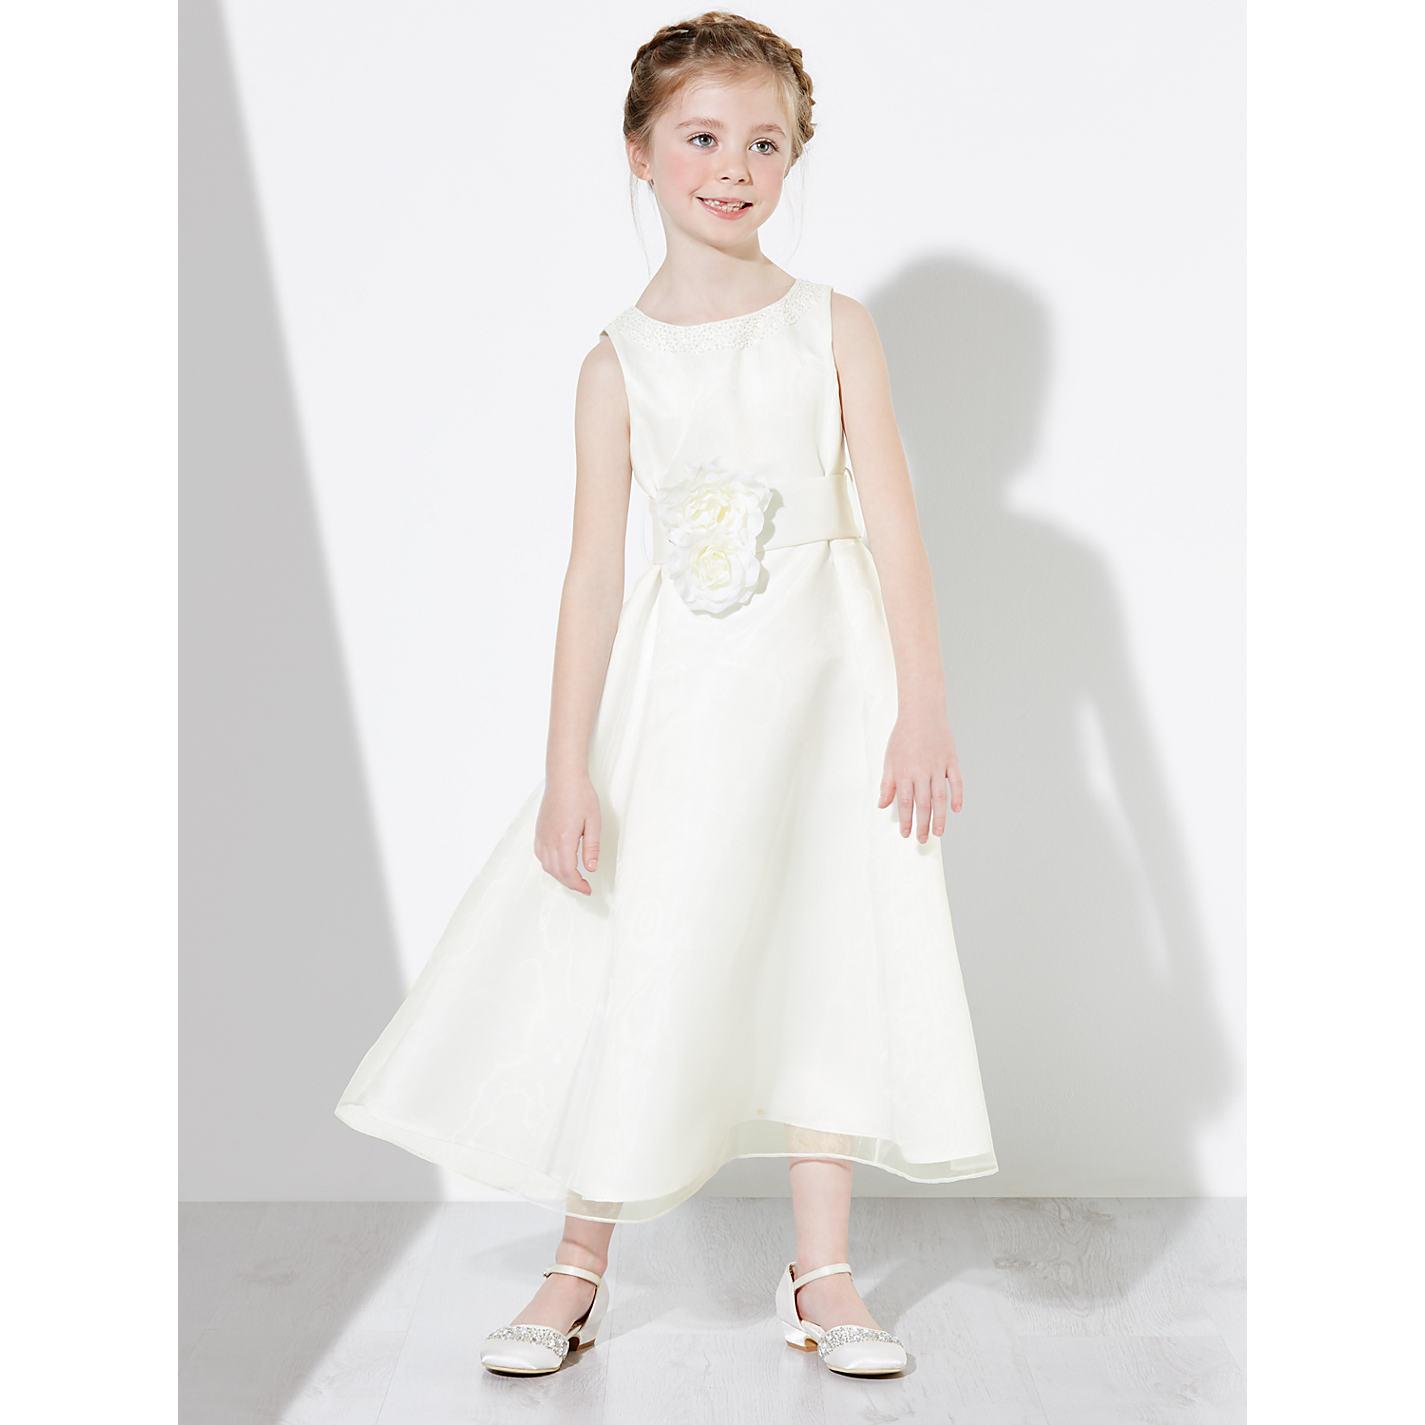 Buy john lewis girls organza bridesmaid dress ivory john lewis buy john lewis girls organza bridesmaid dress ivory online at johnlewis ombrellifo Choice Image